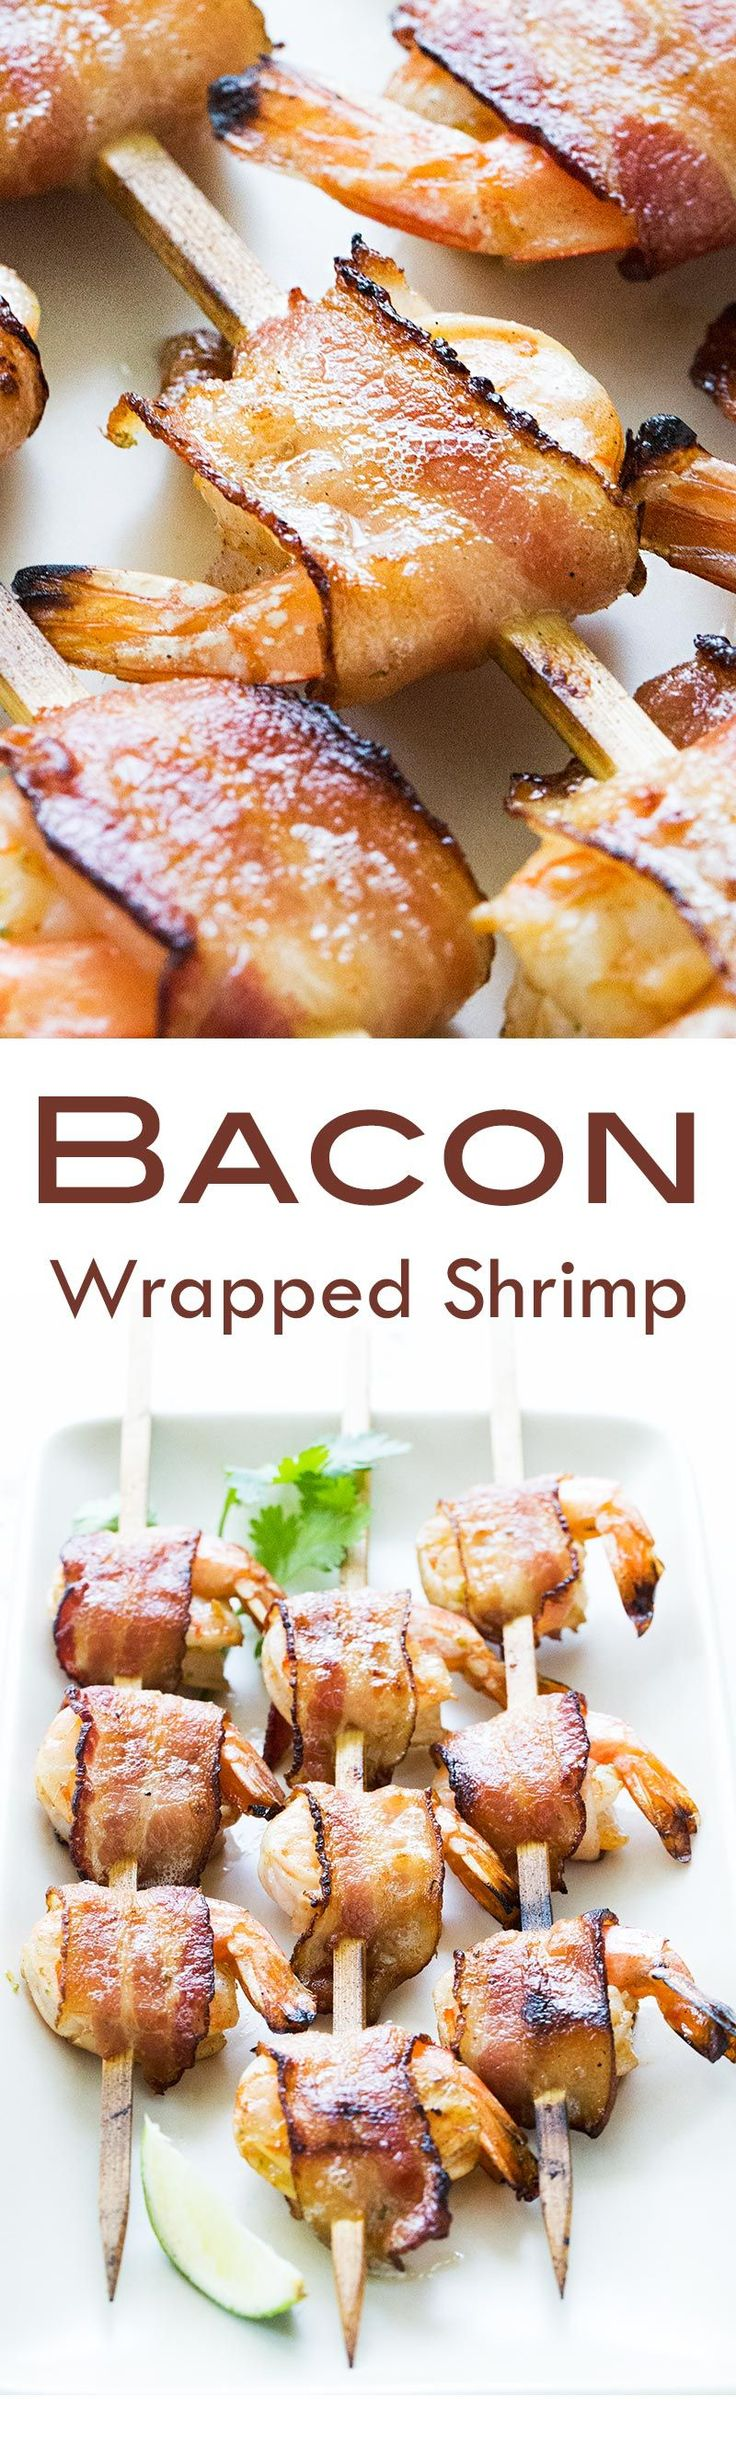 about Oven Shrimp on Pinterest | Shrimp recipes easy, Butter shrimp ...